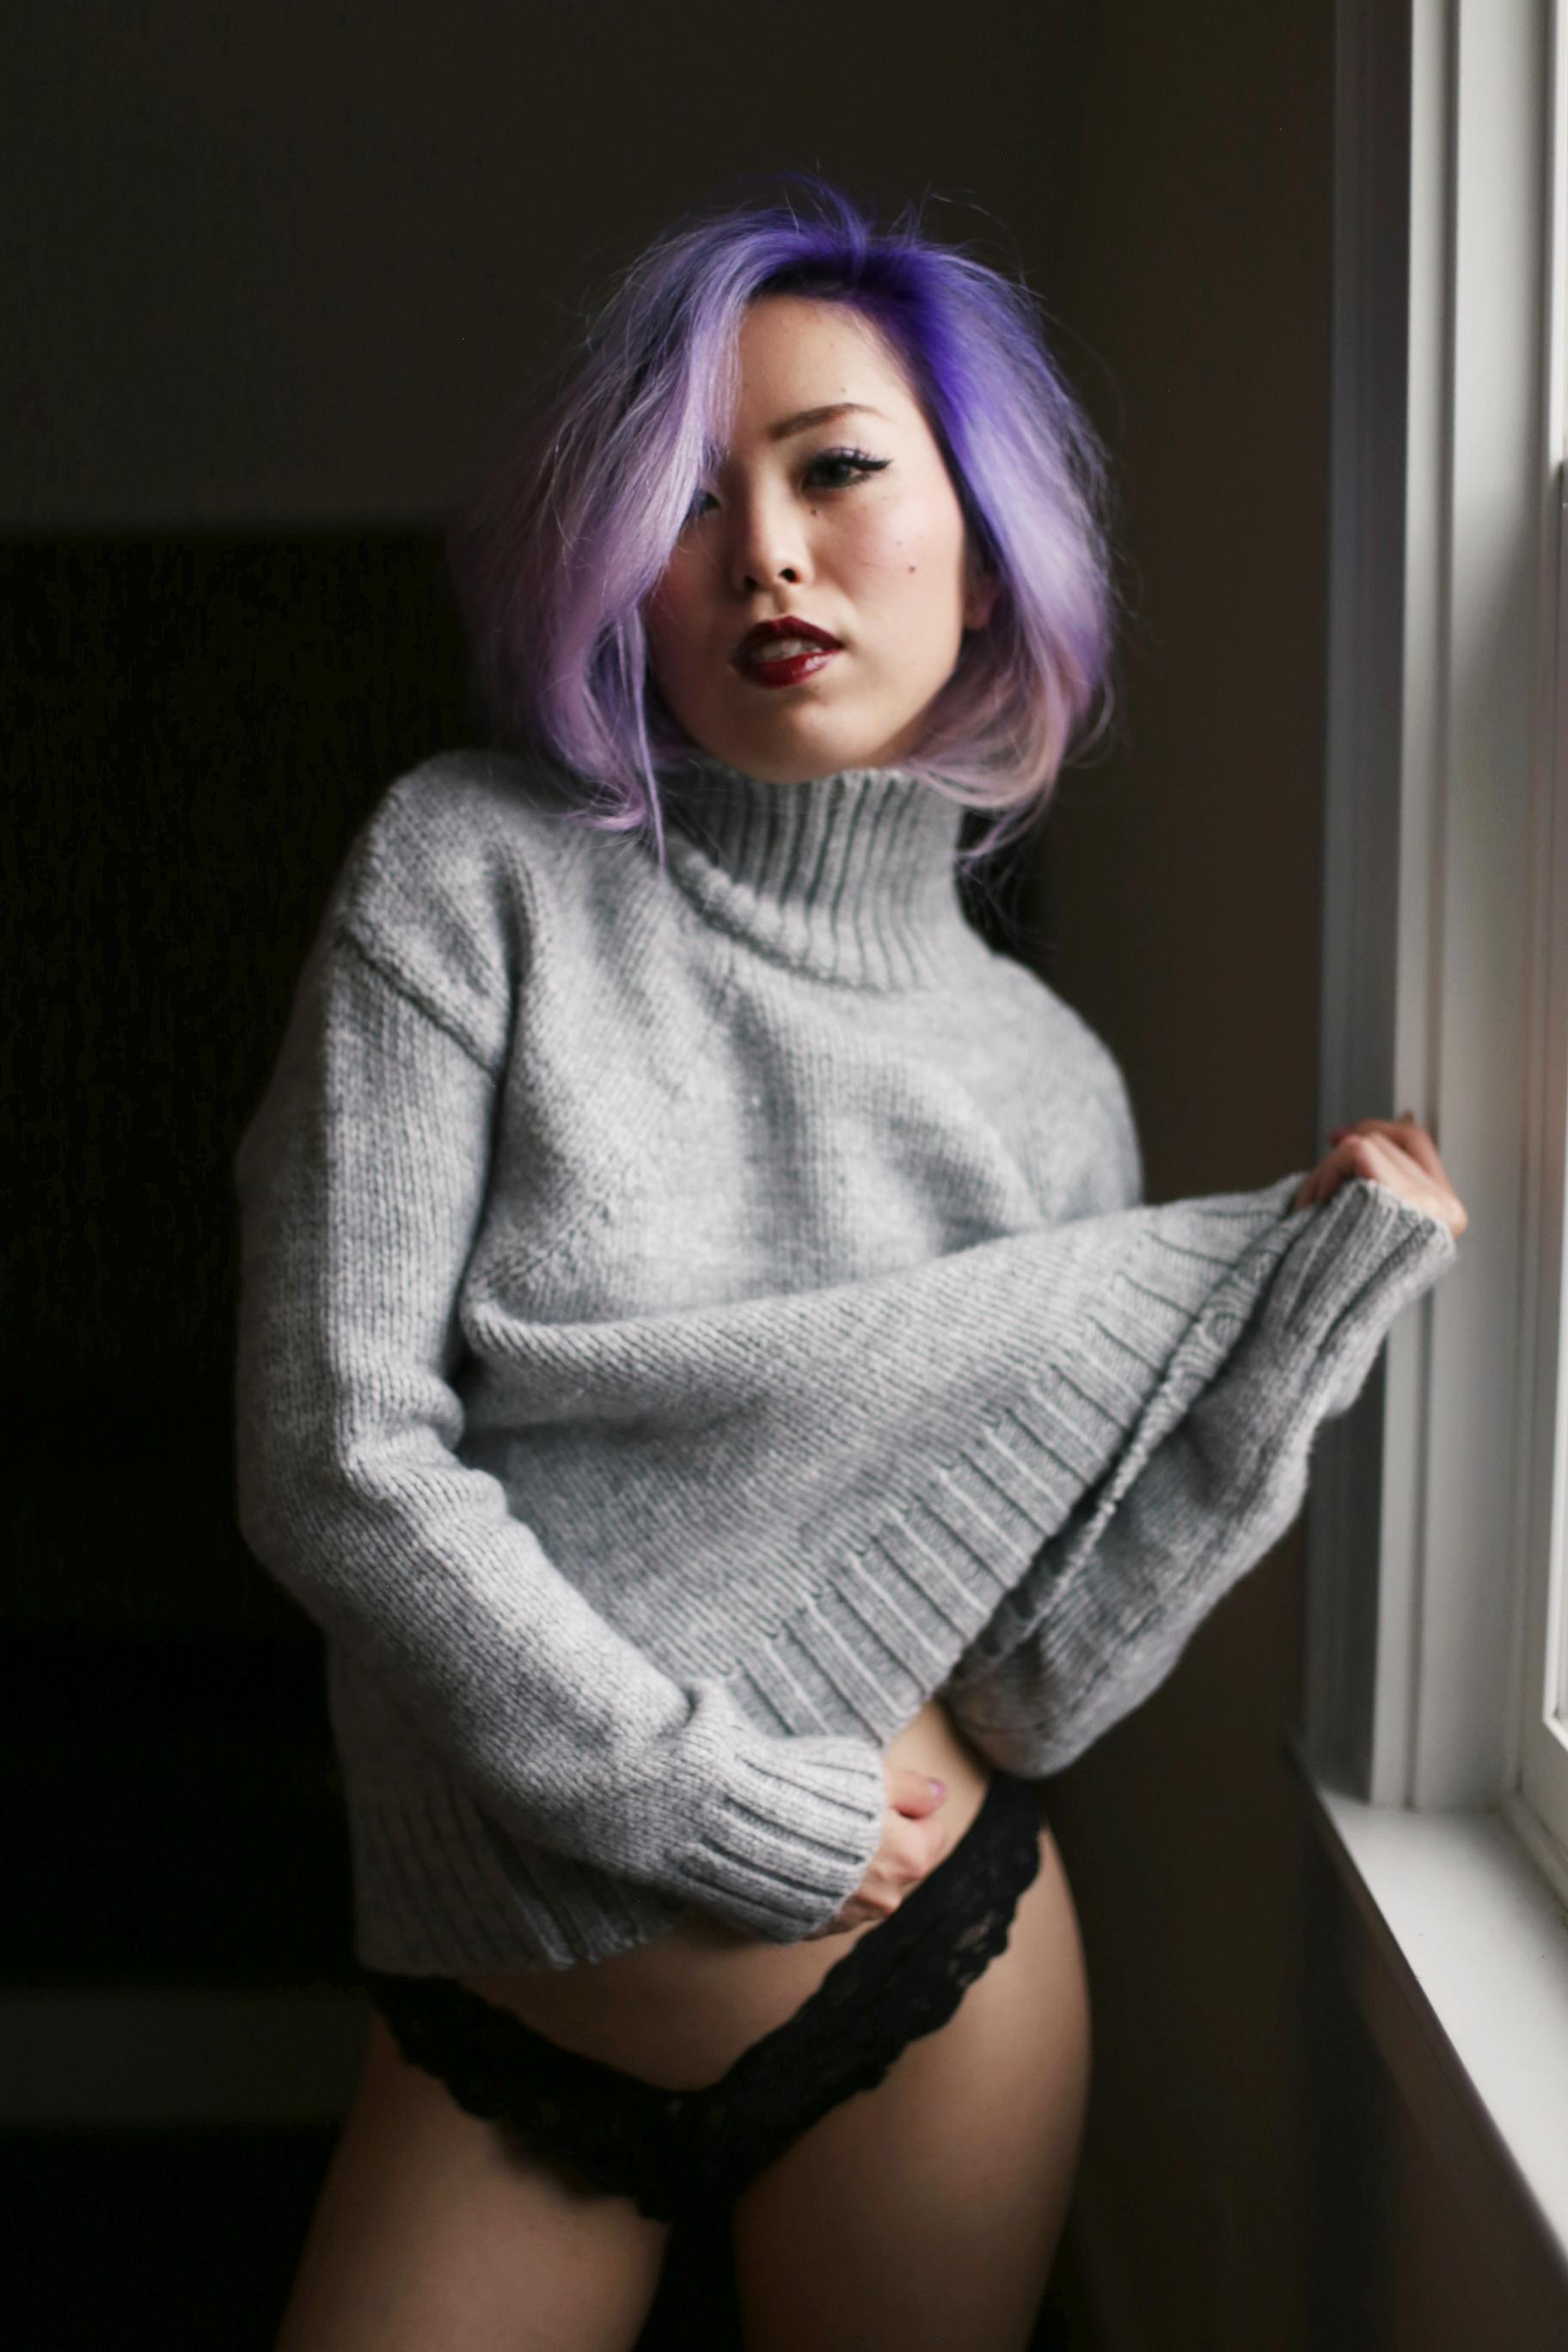 Boudoir Photo-black and white photography-sweater weather-turtle neck sweater-black lingerie-dark lipstick-japanese-Aika's Love Closet-Seattle model-Seattle Style blogger-Lavender Hair-colored Hair-Mermaid Hair-Zara Sweater 11